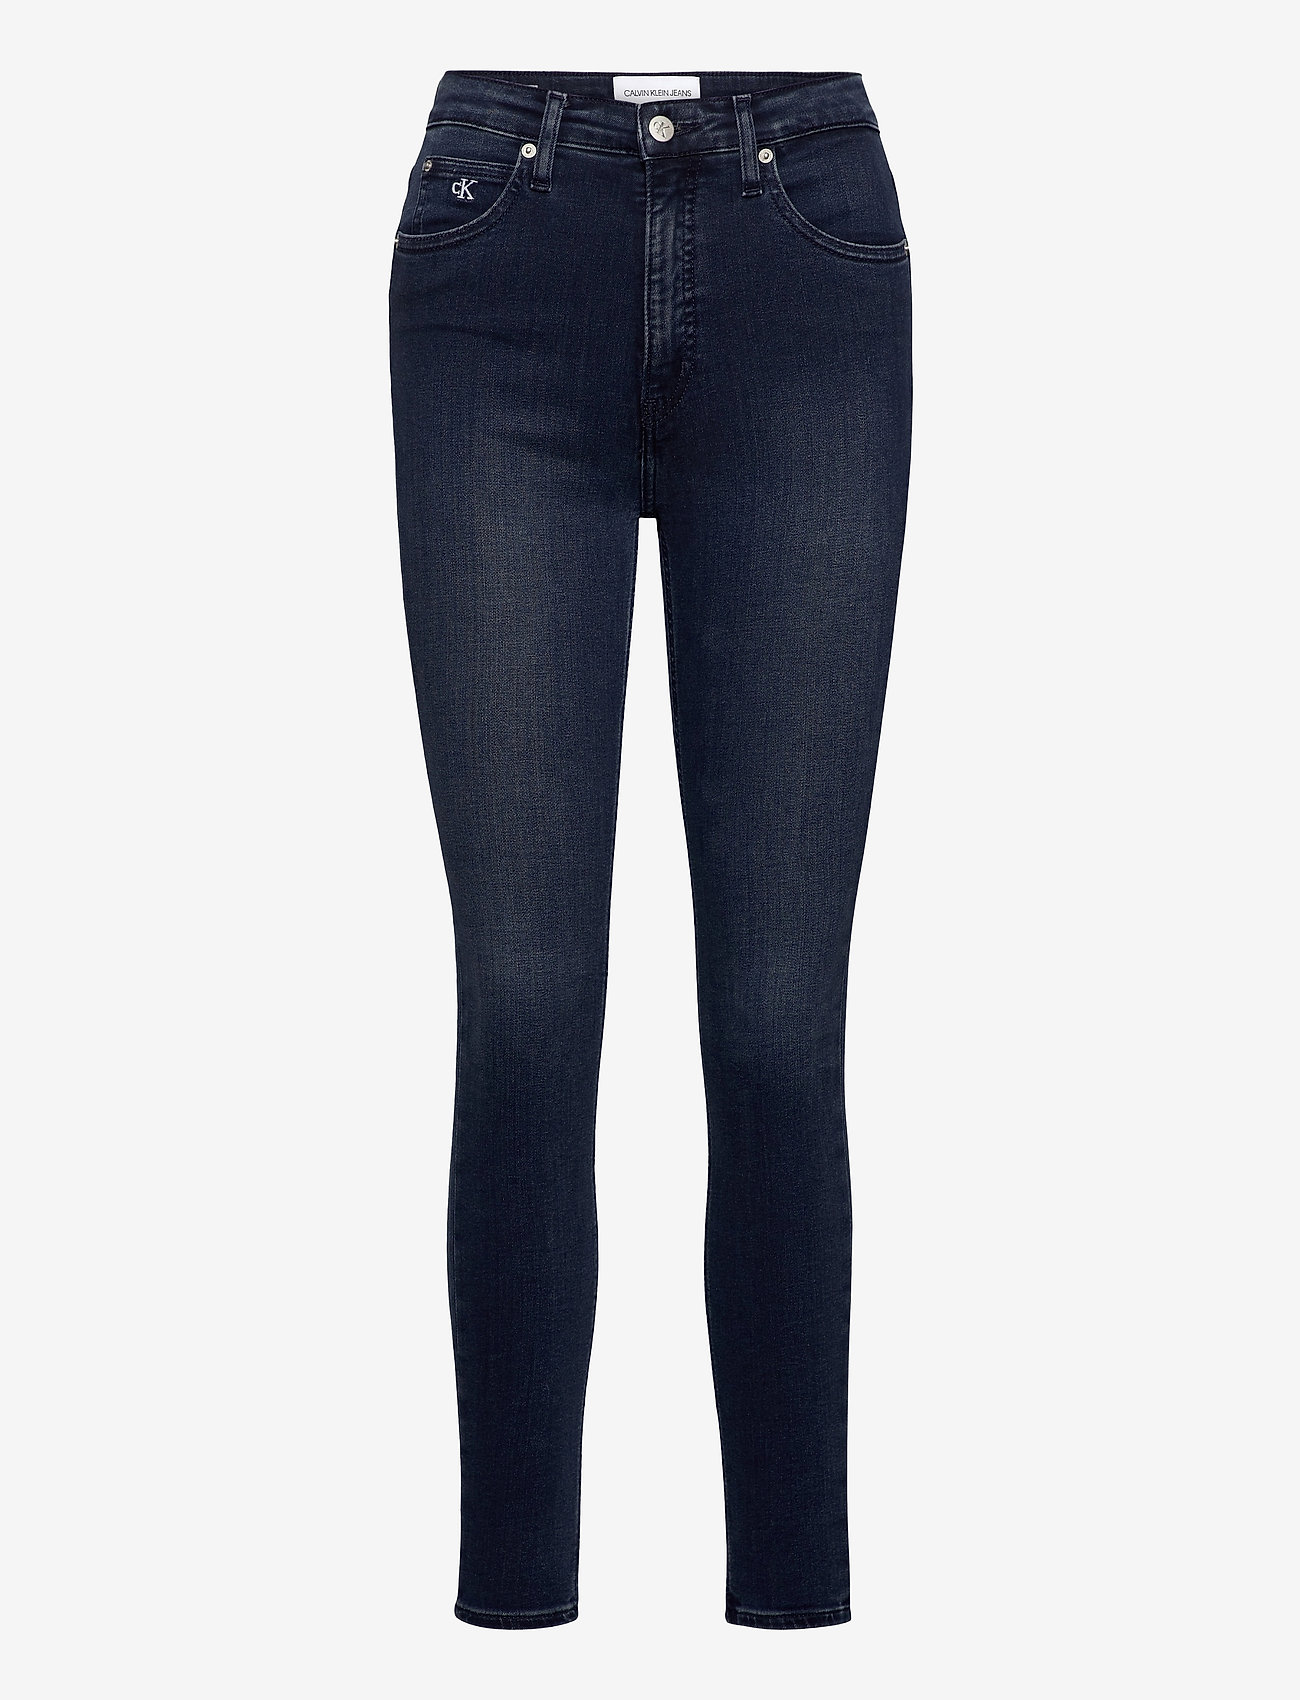 Calvin Klein Jeans - HIGH RISE SUPER SKINNY ANKLE - skinny jeans - denim dark - 0